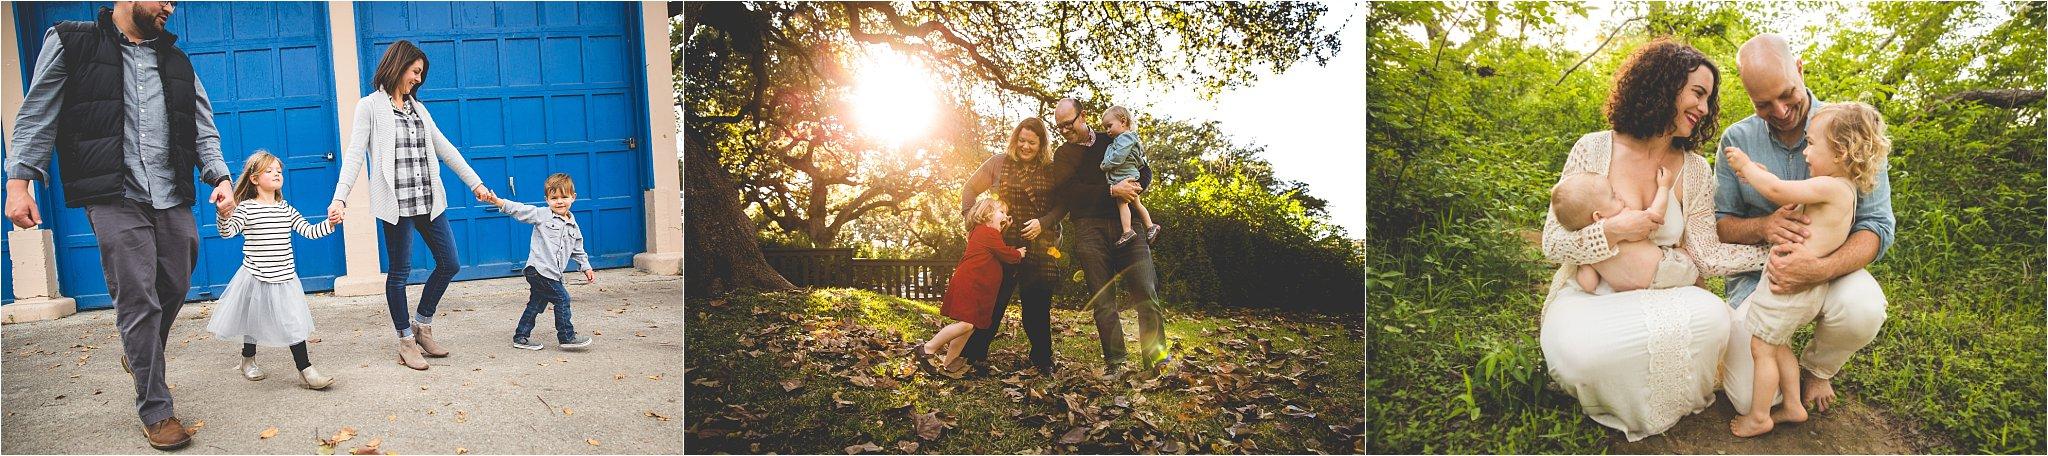 austin family photography faq